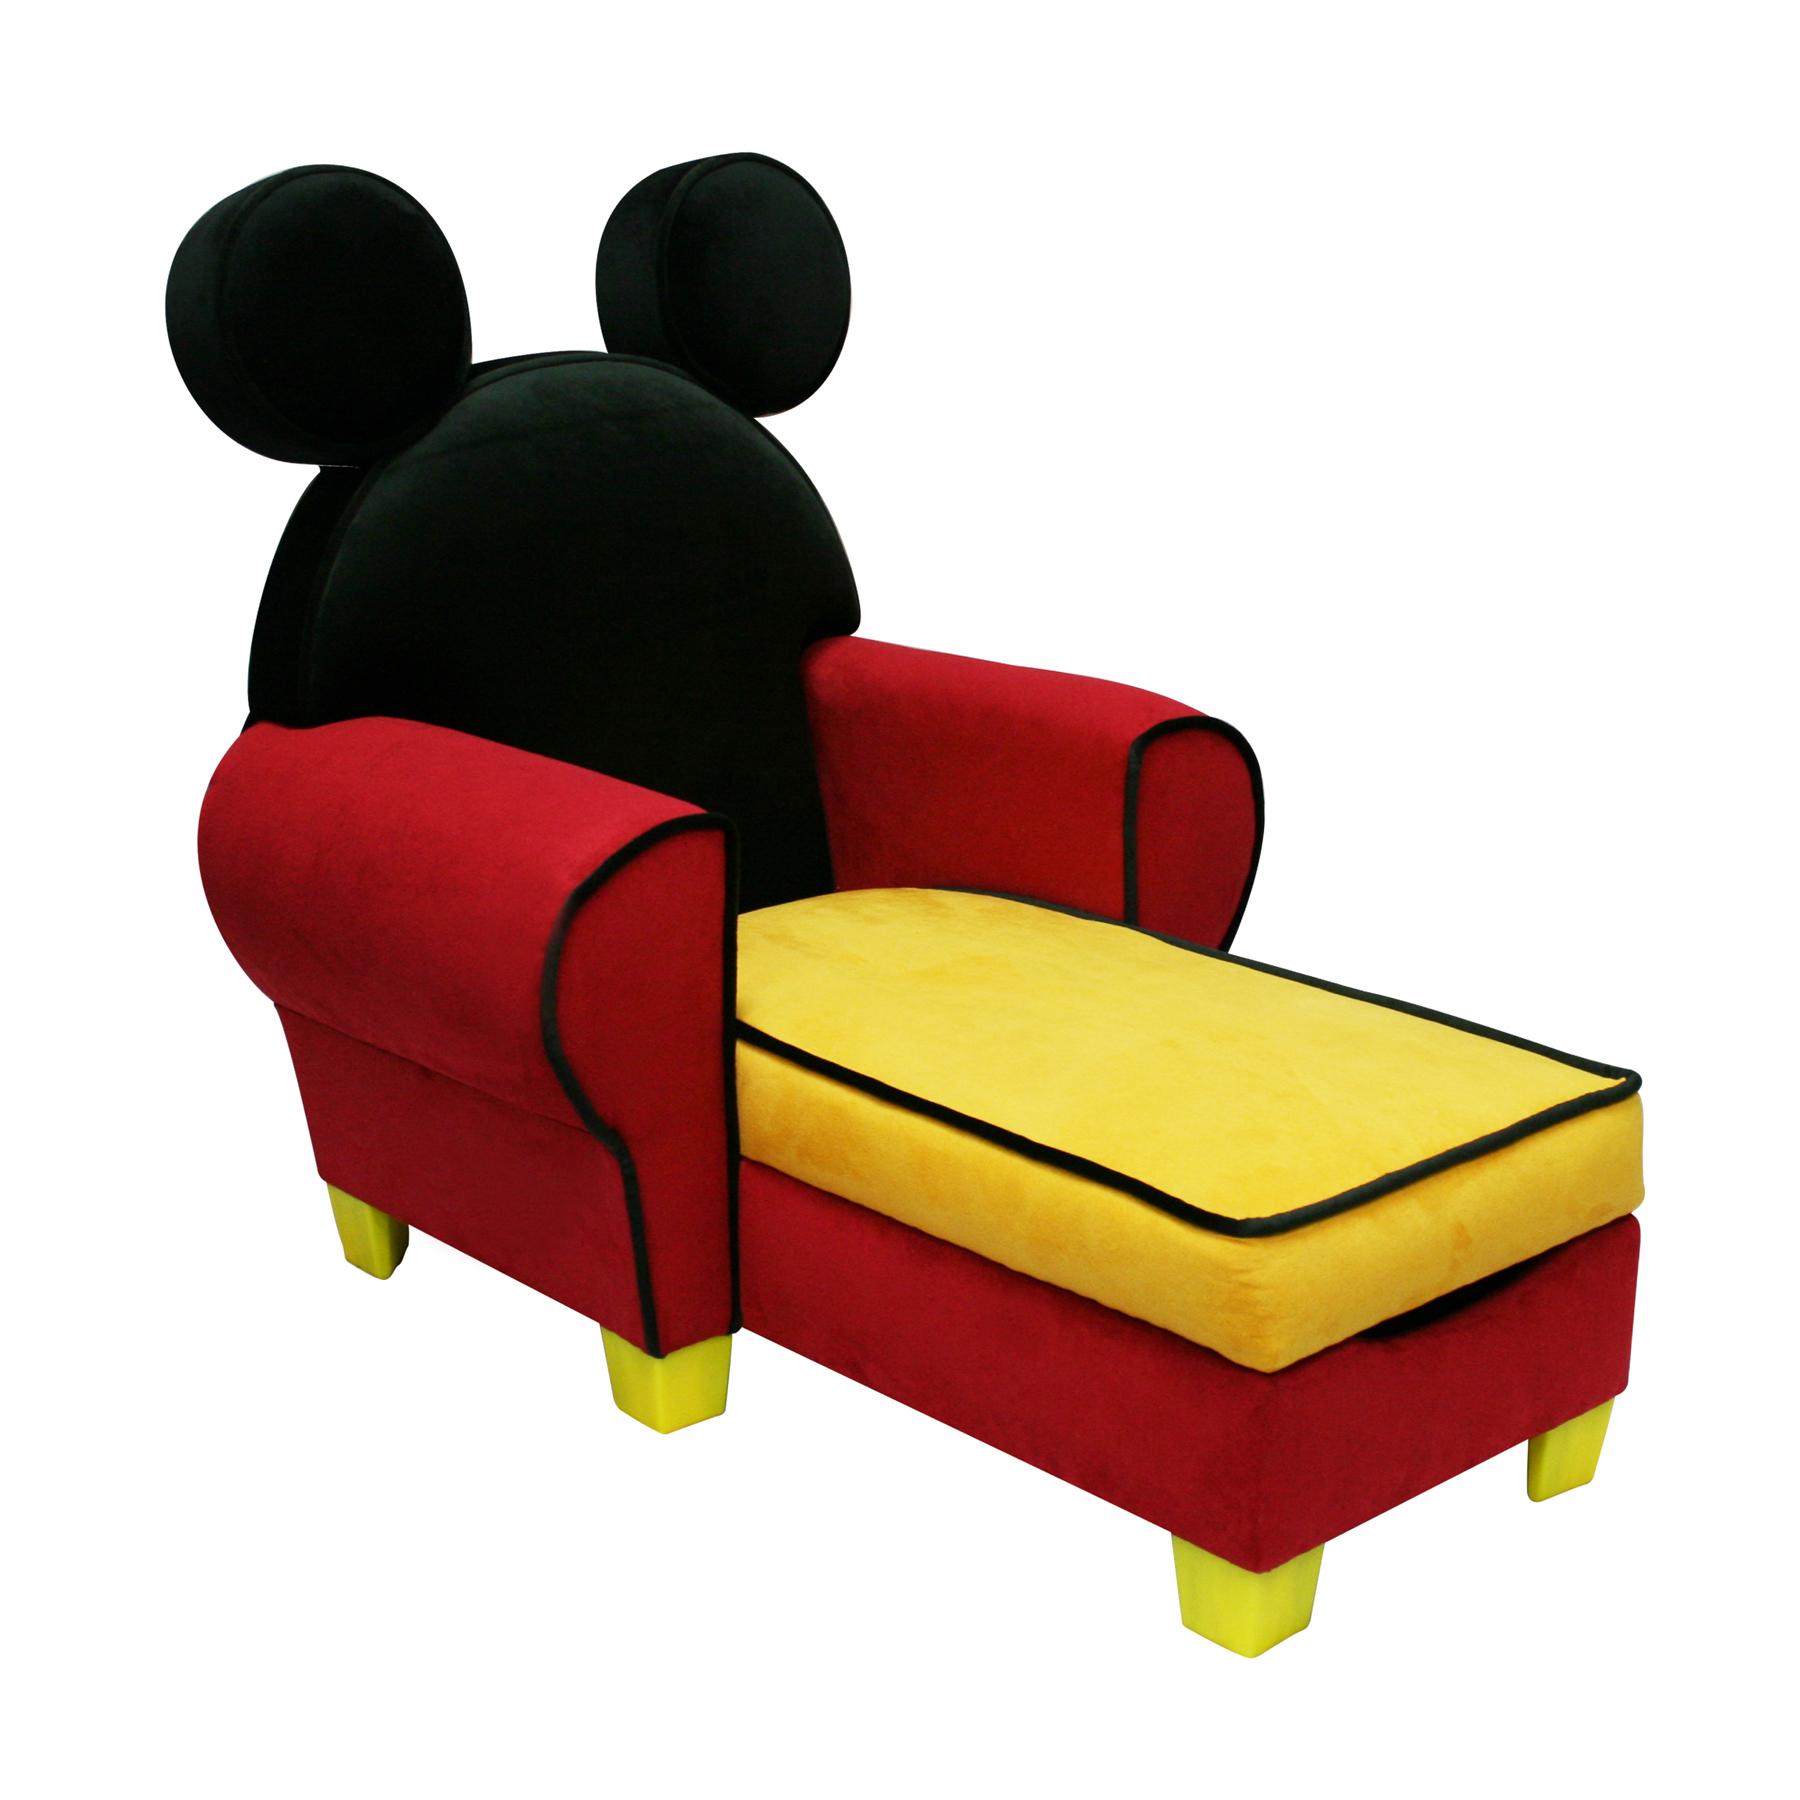 children s furniture by miguel almena at coroflot